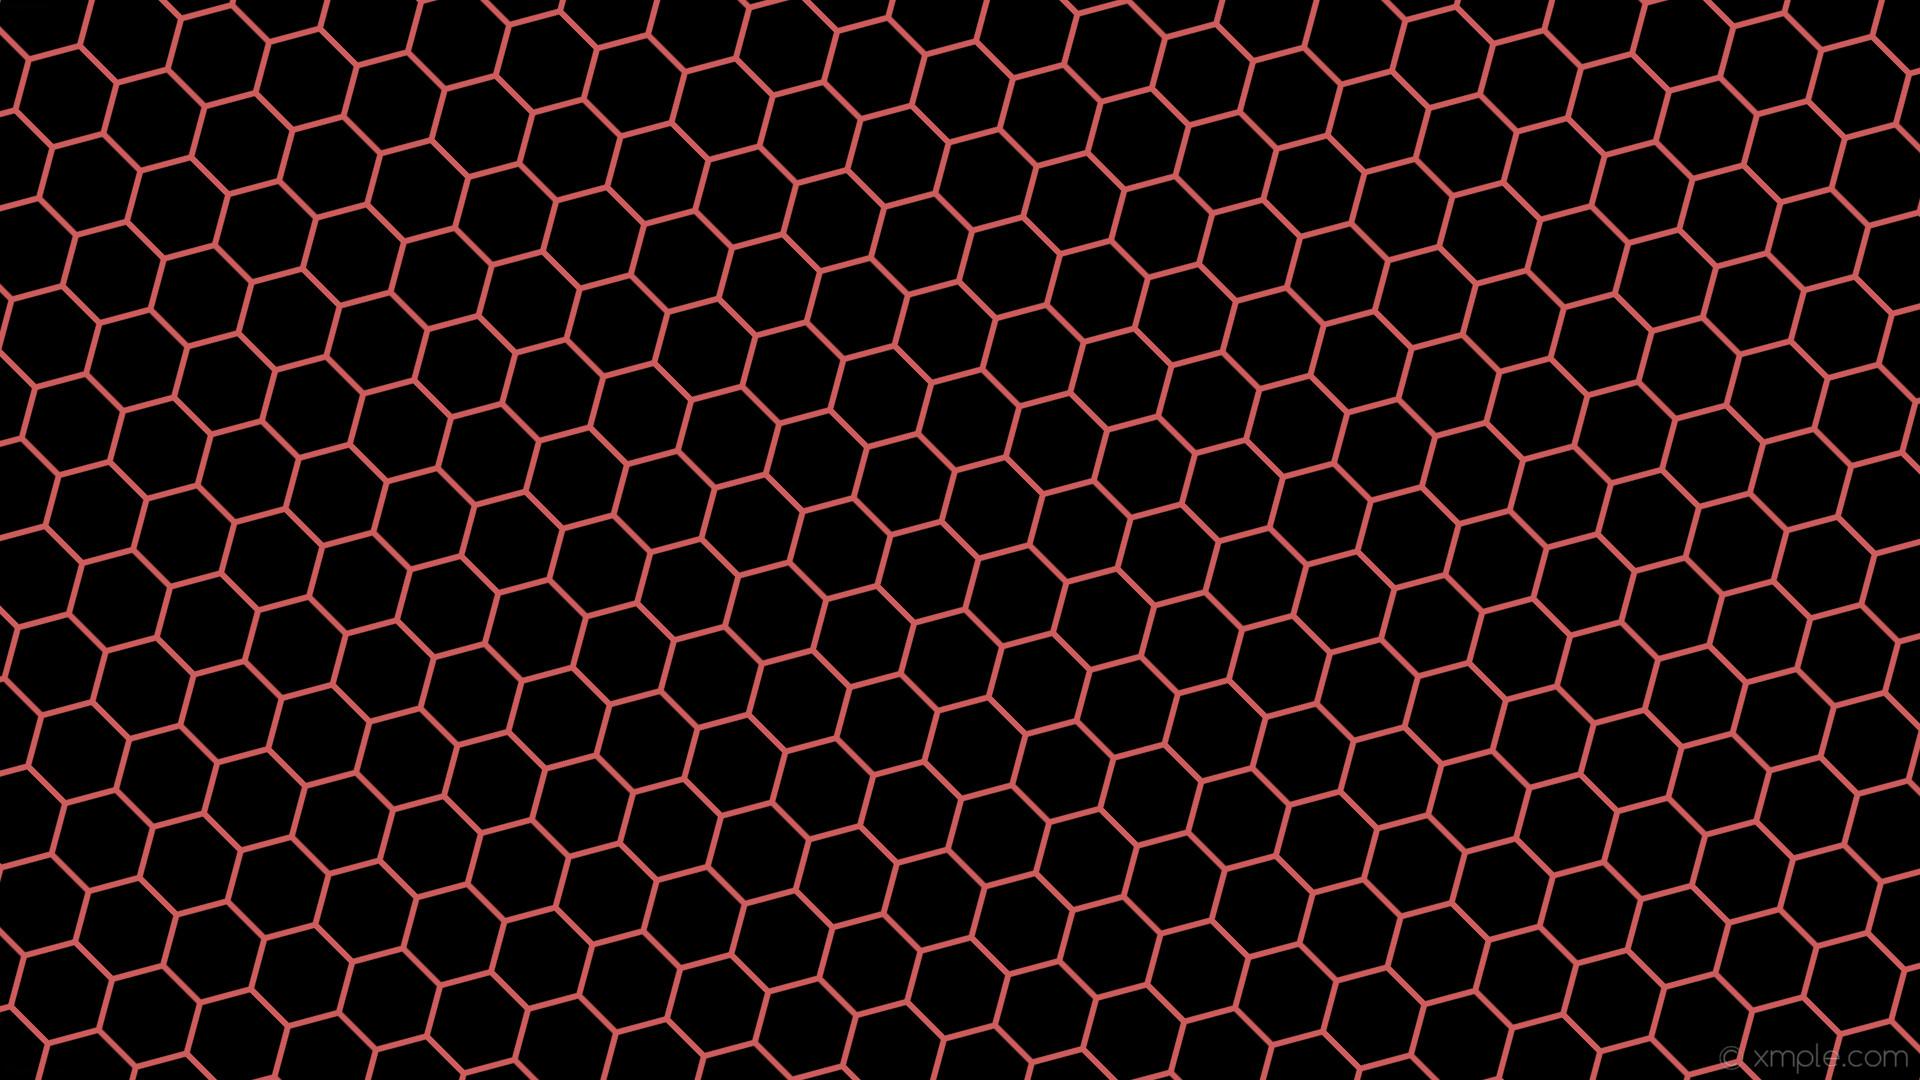 wallpaper red black honeycomb hexagon beehive indian red #000000 #cd5c5c  diagonal 45° 6px